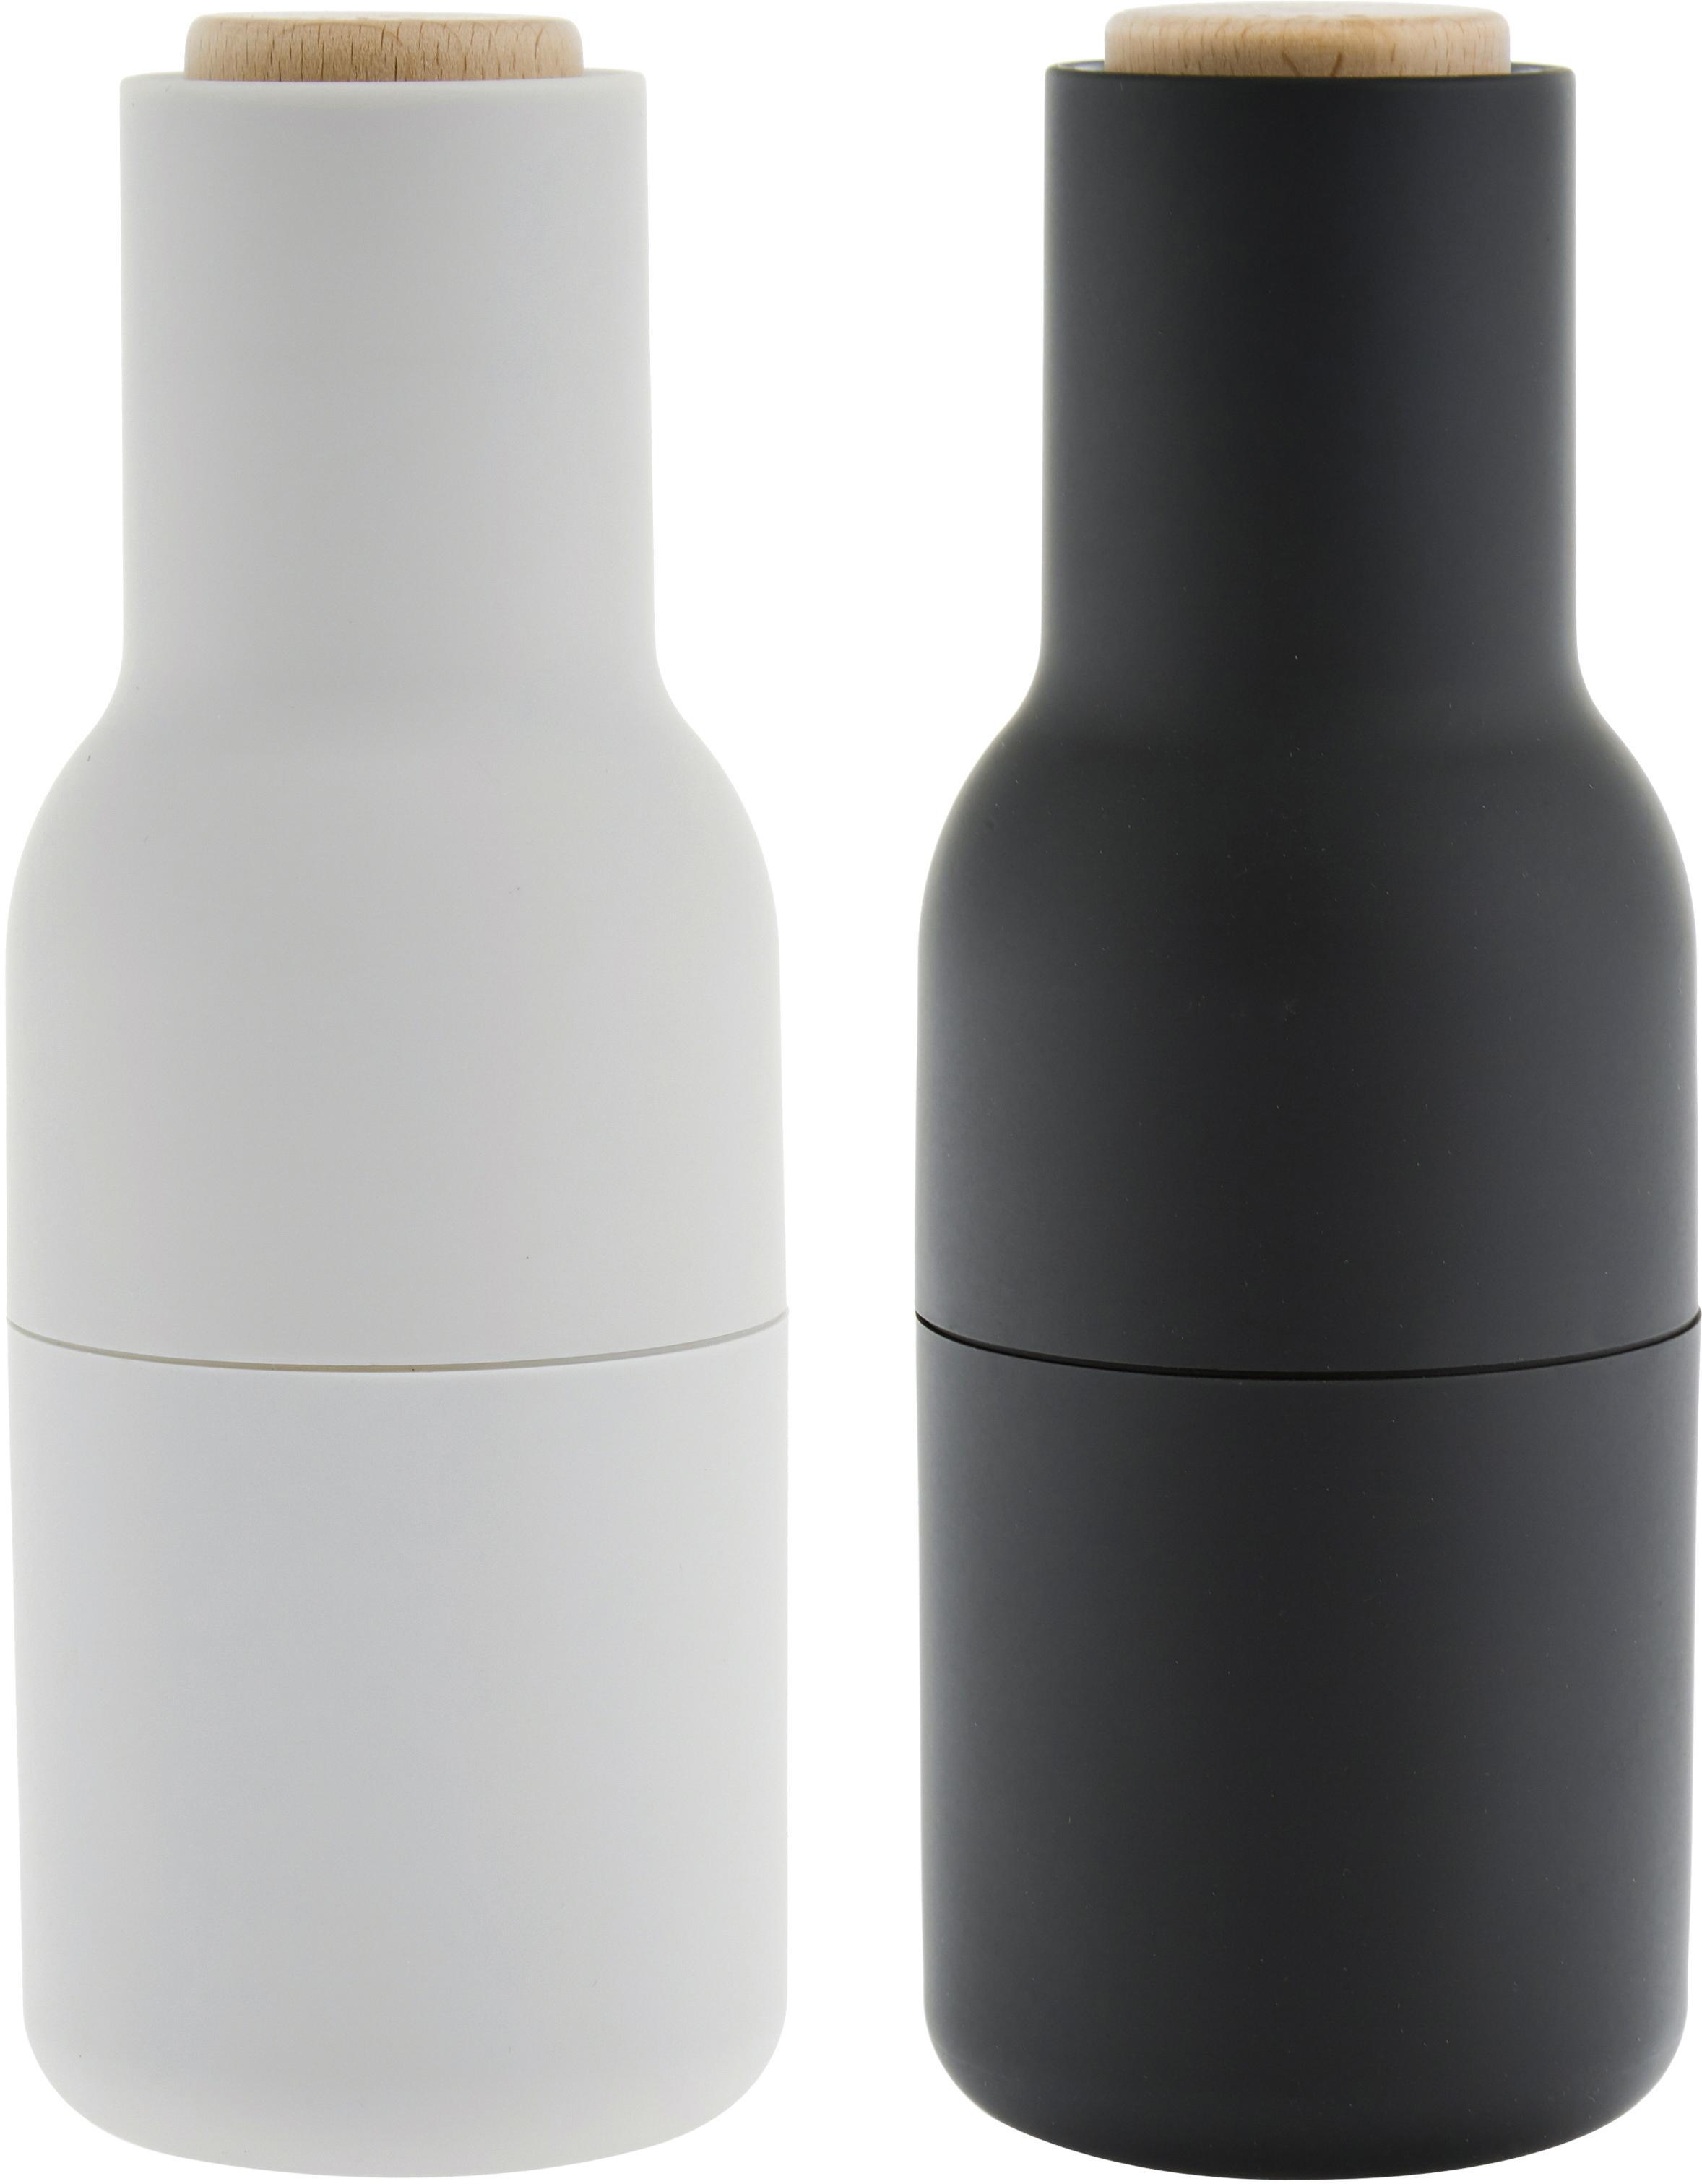 Designer peper- en zoutmolen Bottle Grinder met RVS deksel, Frame: kunststof, Deksel: hout, Antraciet, lichtgrijs, bruin, Ø 8 x H 21 cm